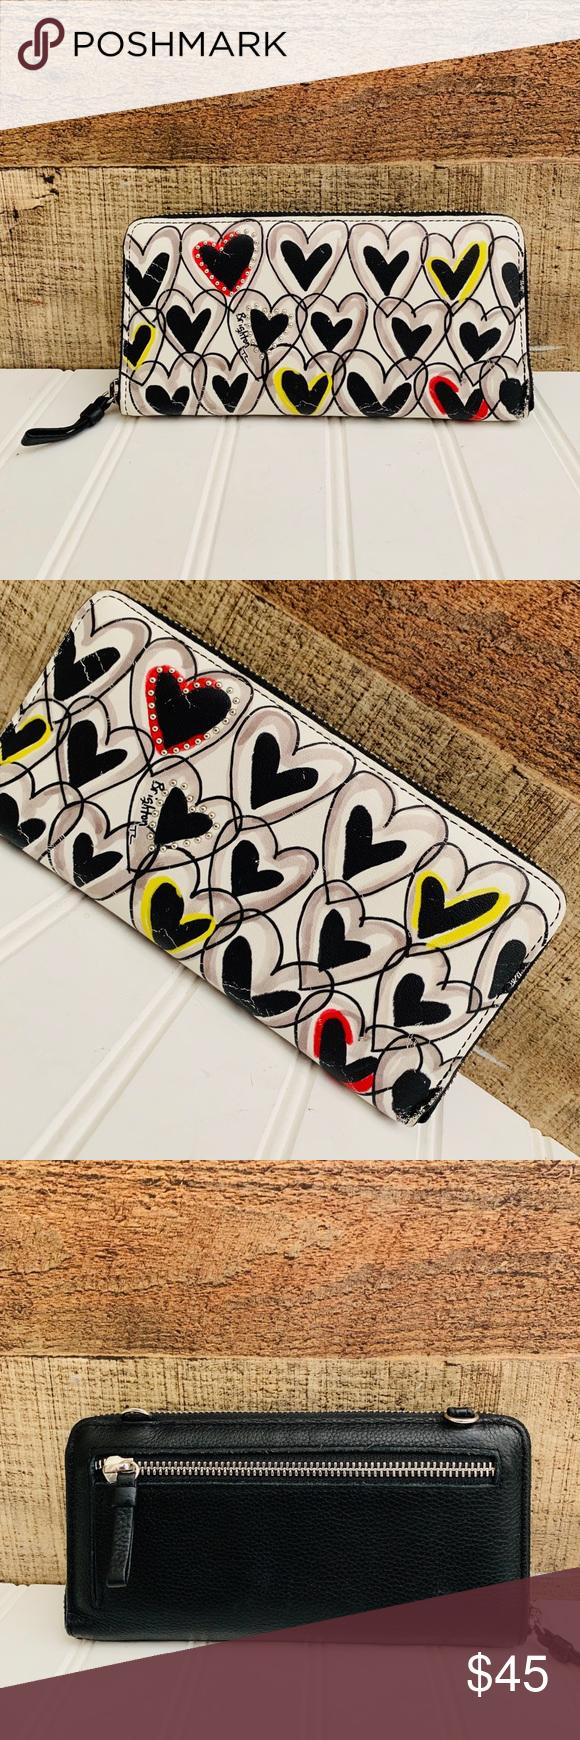 Brighton heart leather zip around wallet Pre loved Pet snd